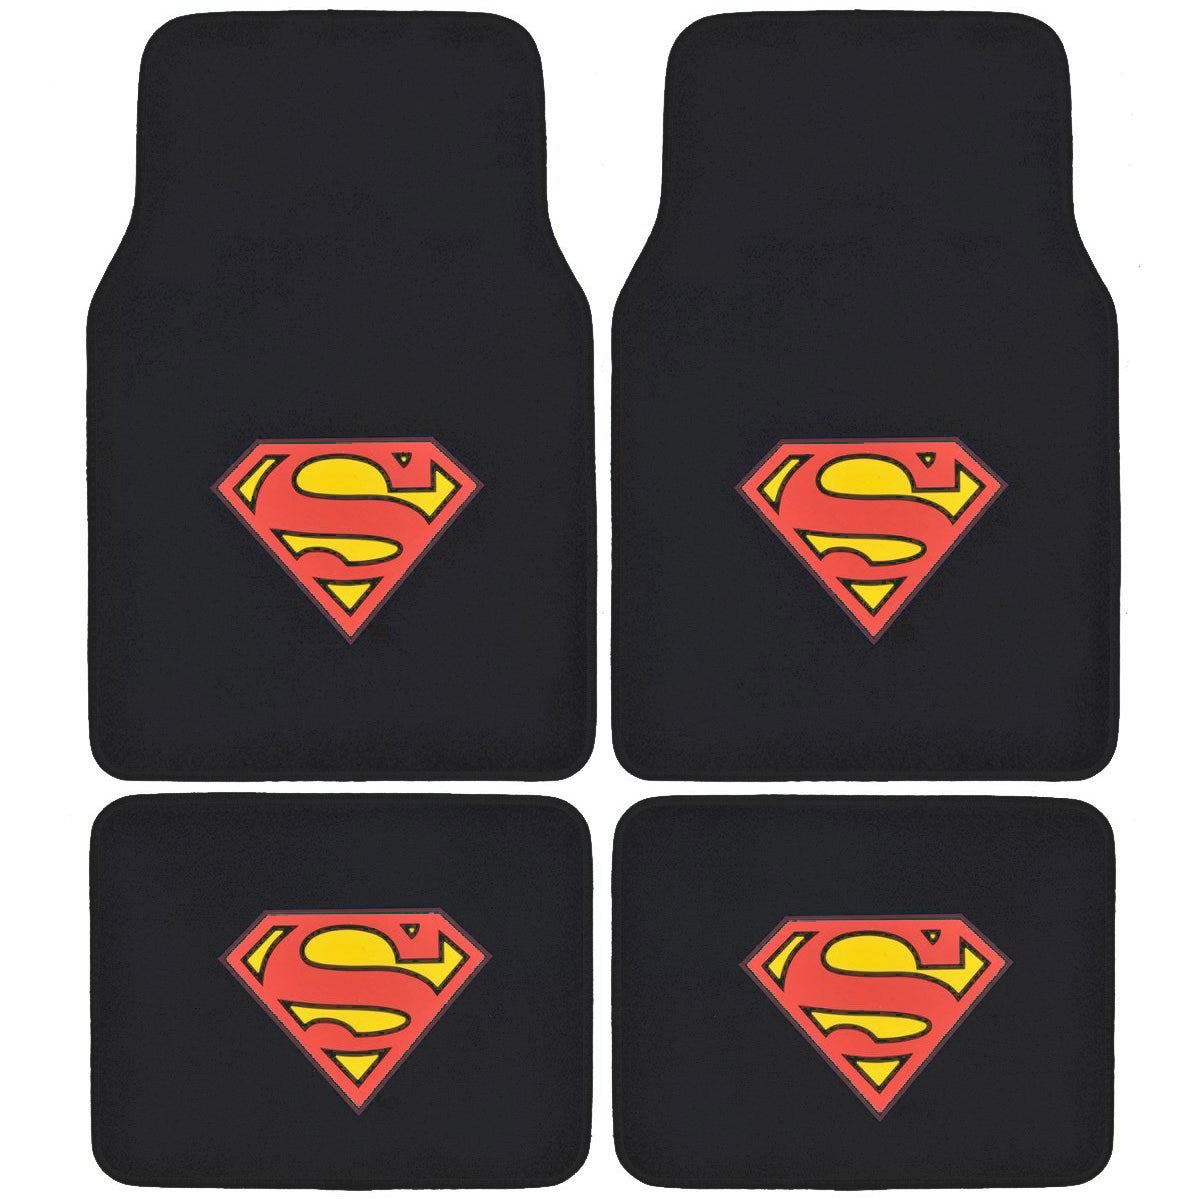 Batman or Superman Vehicle Floor Mats (Set of 4) (Superma...